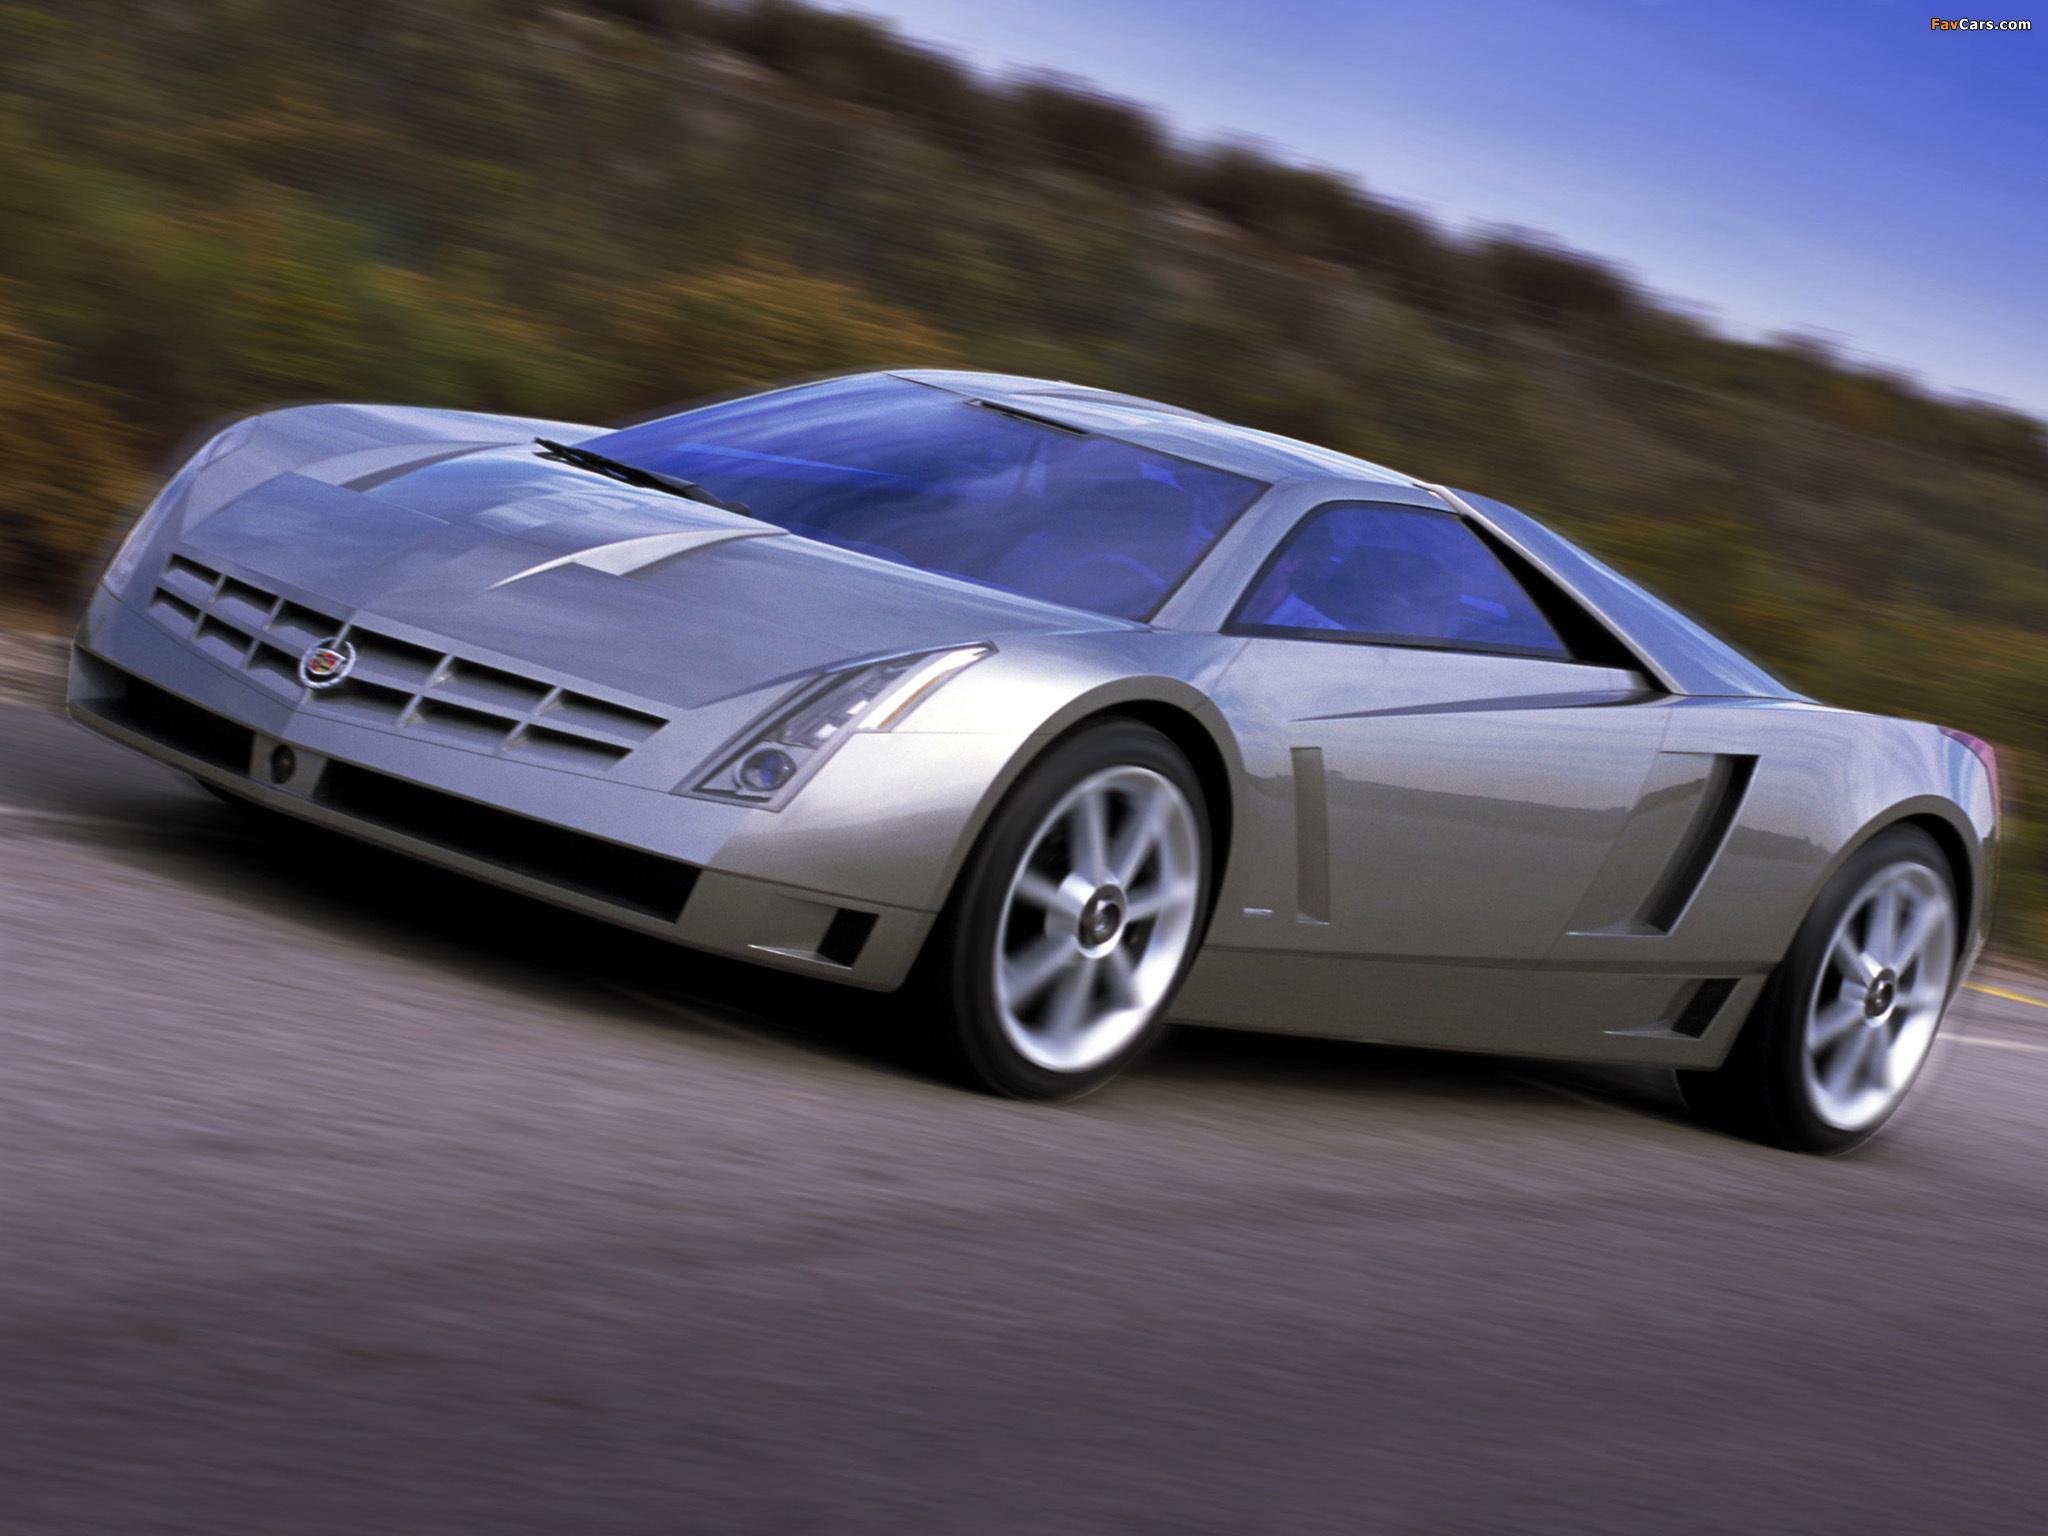 Cadillac Cien Concept 2002 images (2048 x 1536)